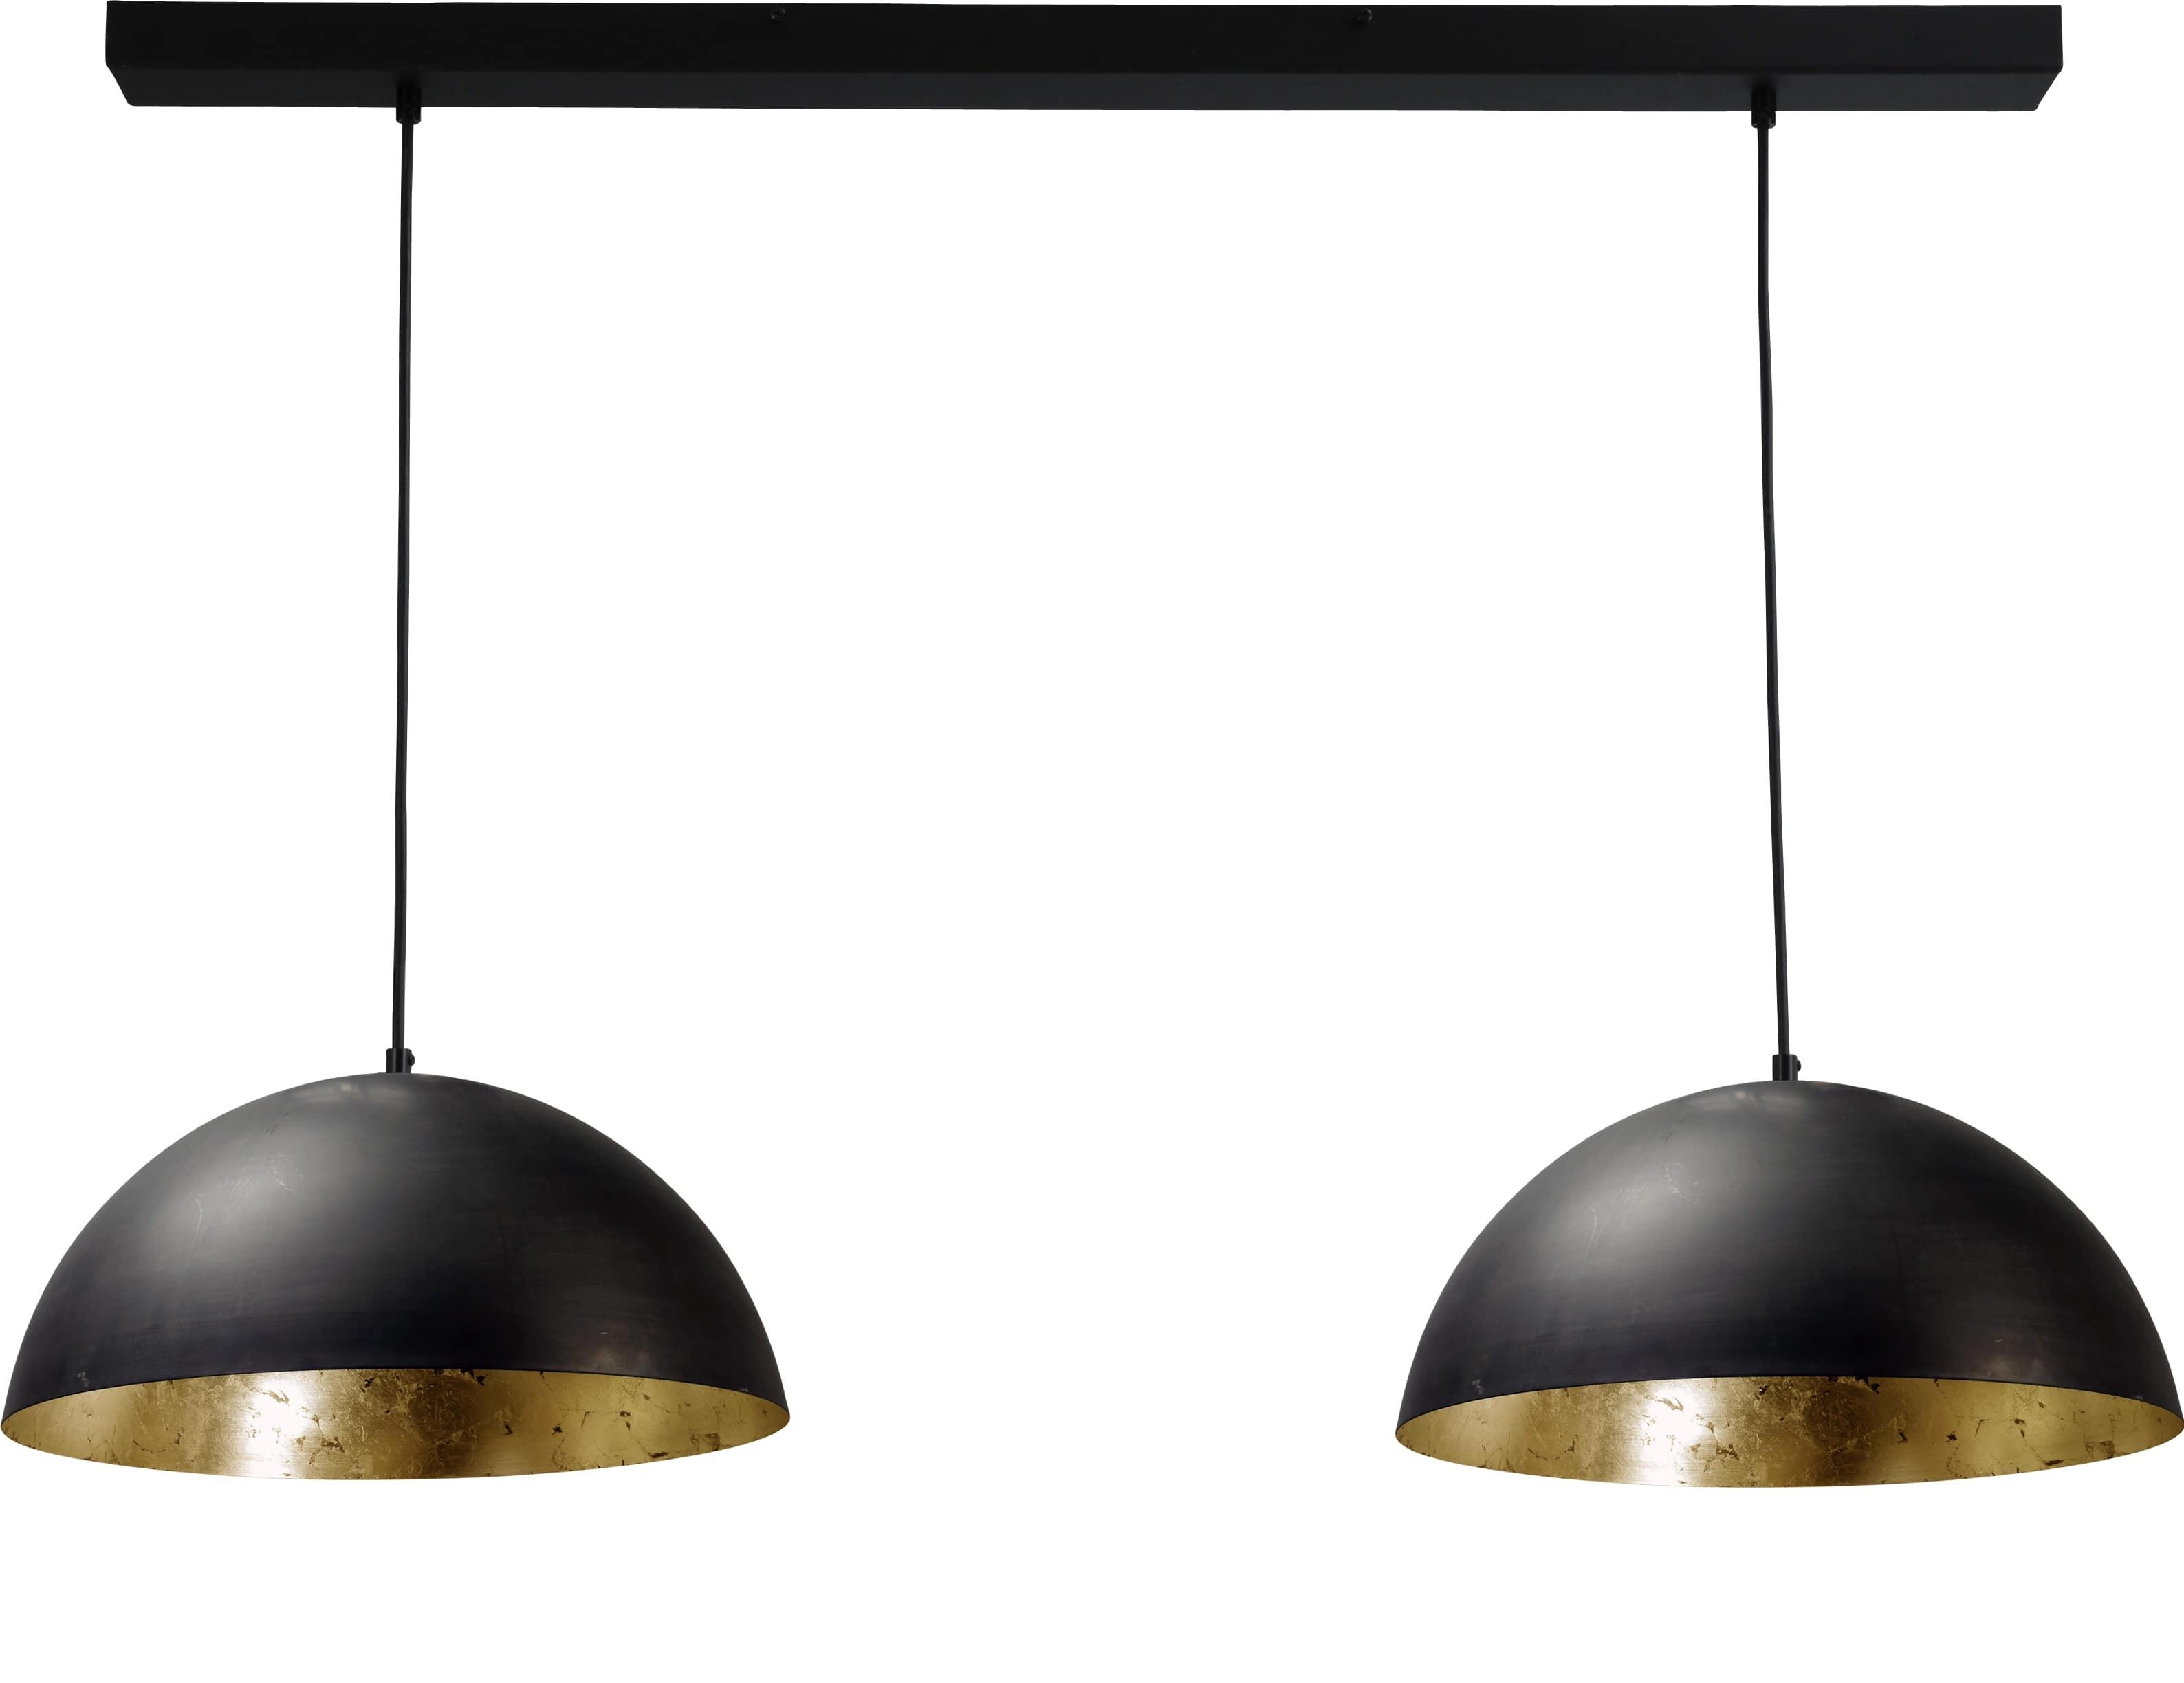 hanglamp gunmetal outside goldleaf inside